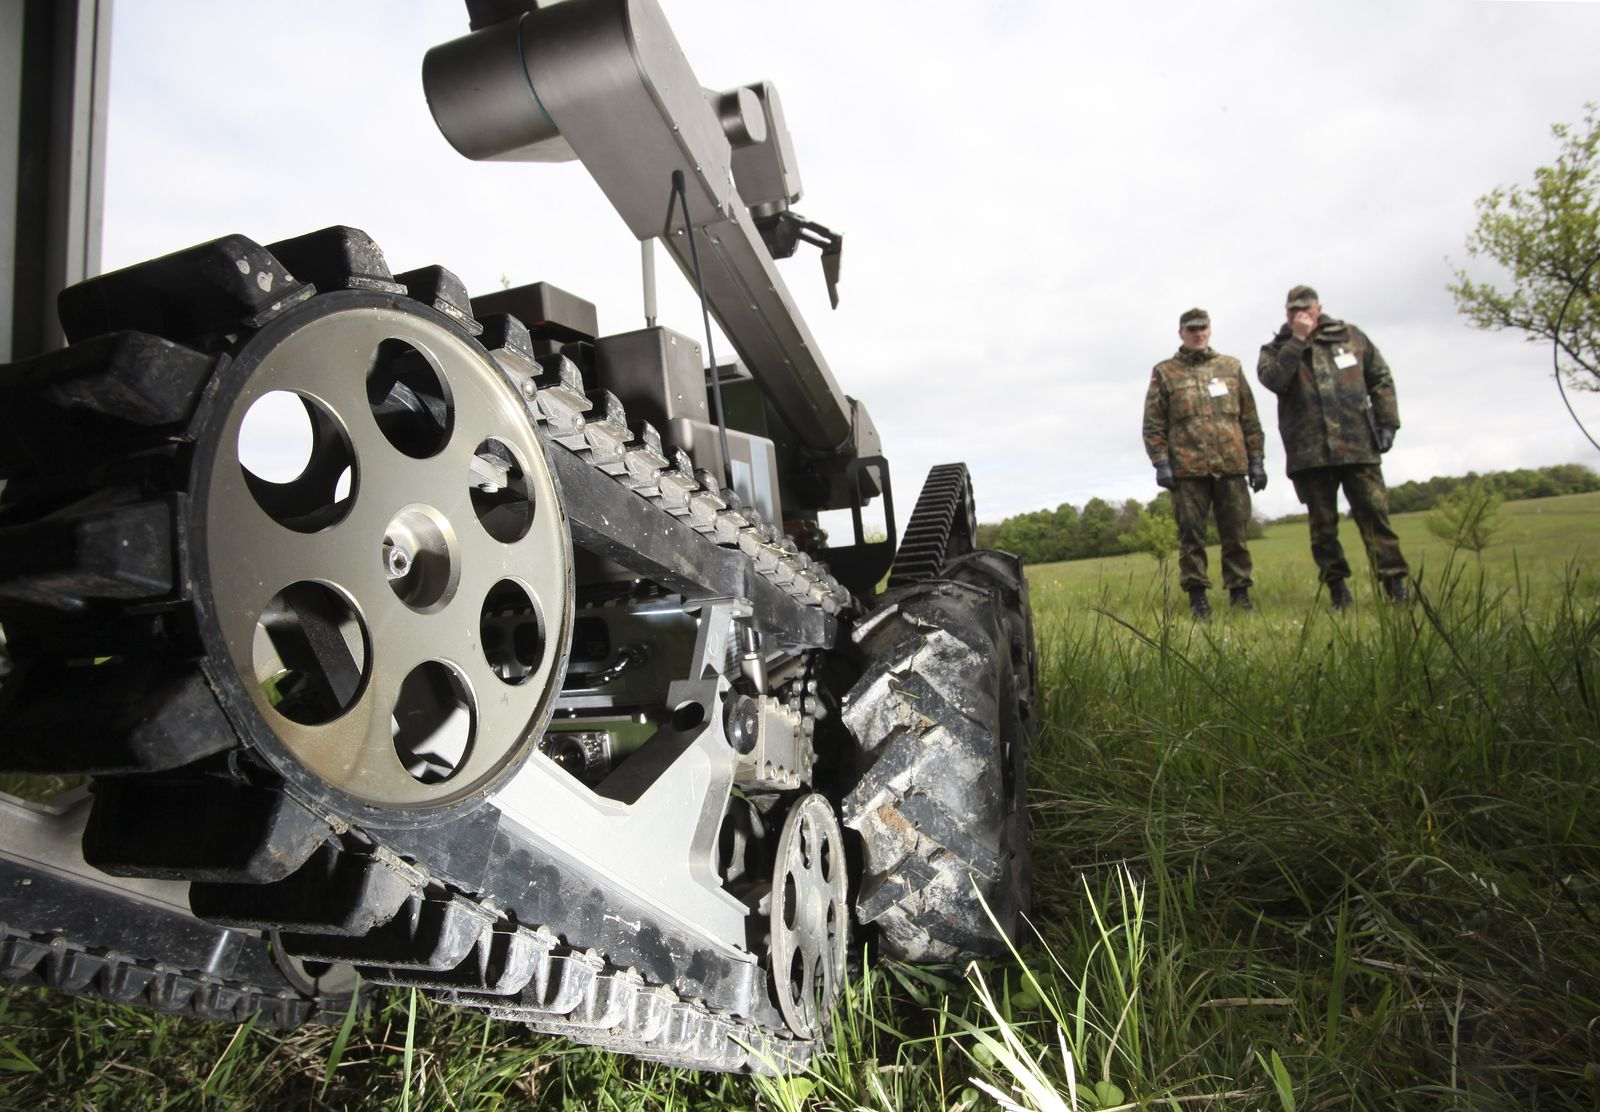 European Land Robot Trials ELROB 2010